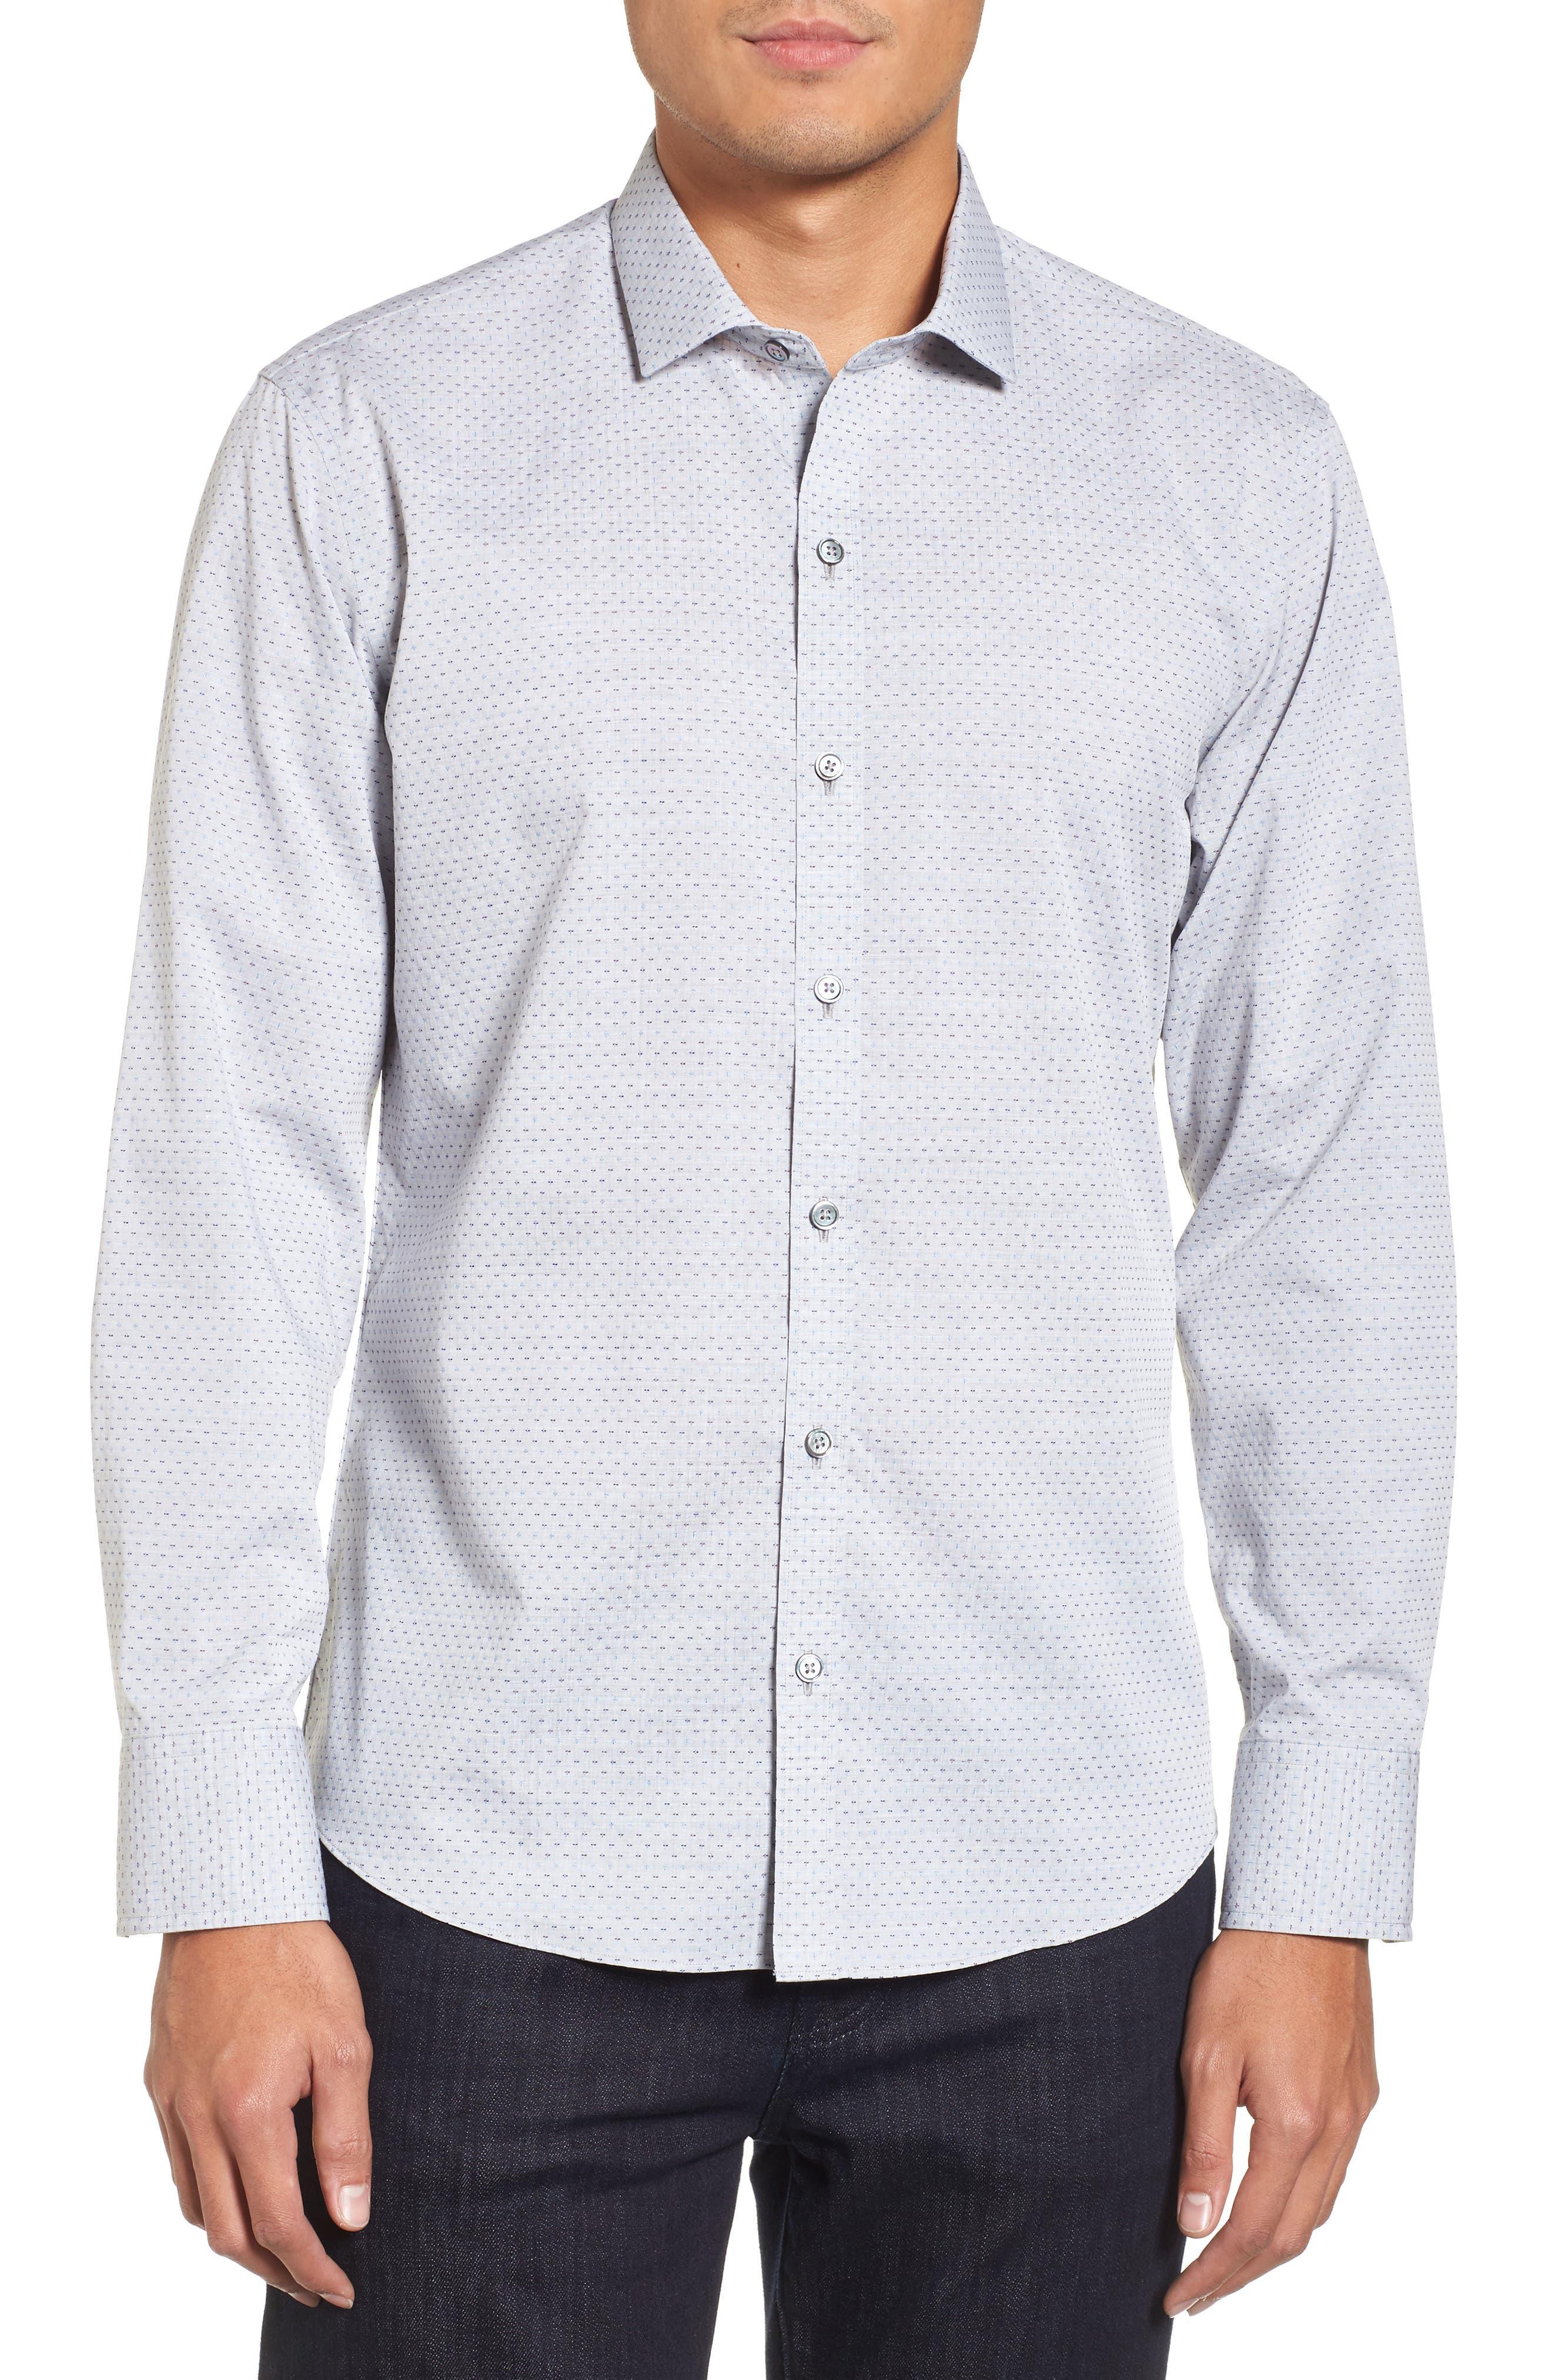 Atila Slim Fit Dobby Woven Sport Shirt,                             Main thumbnail 1, color,                             050